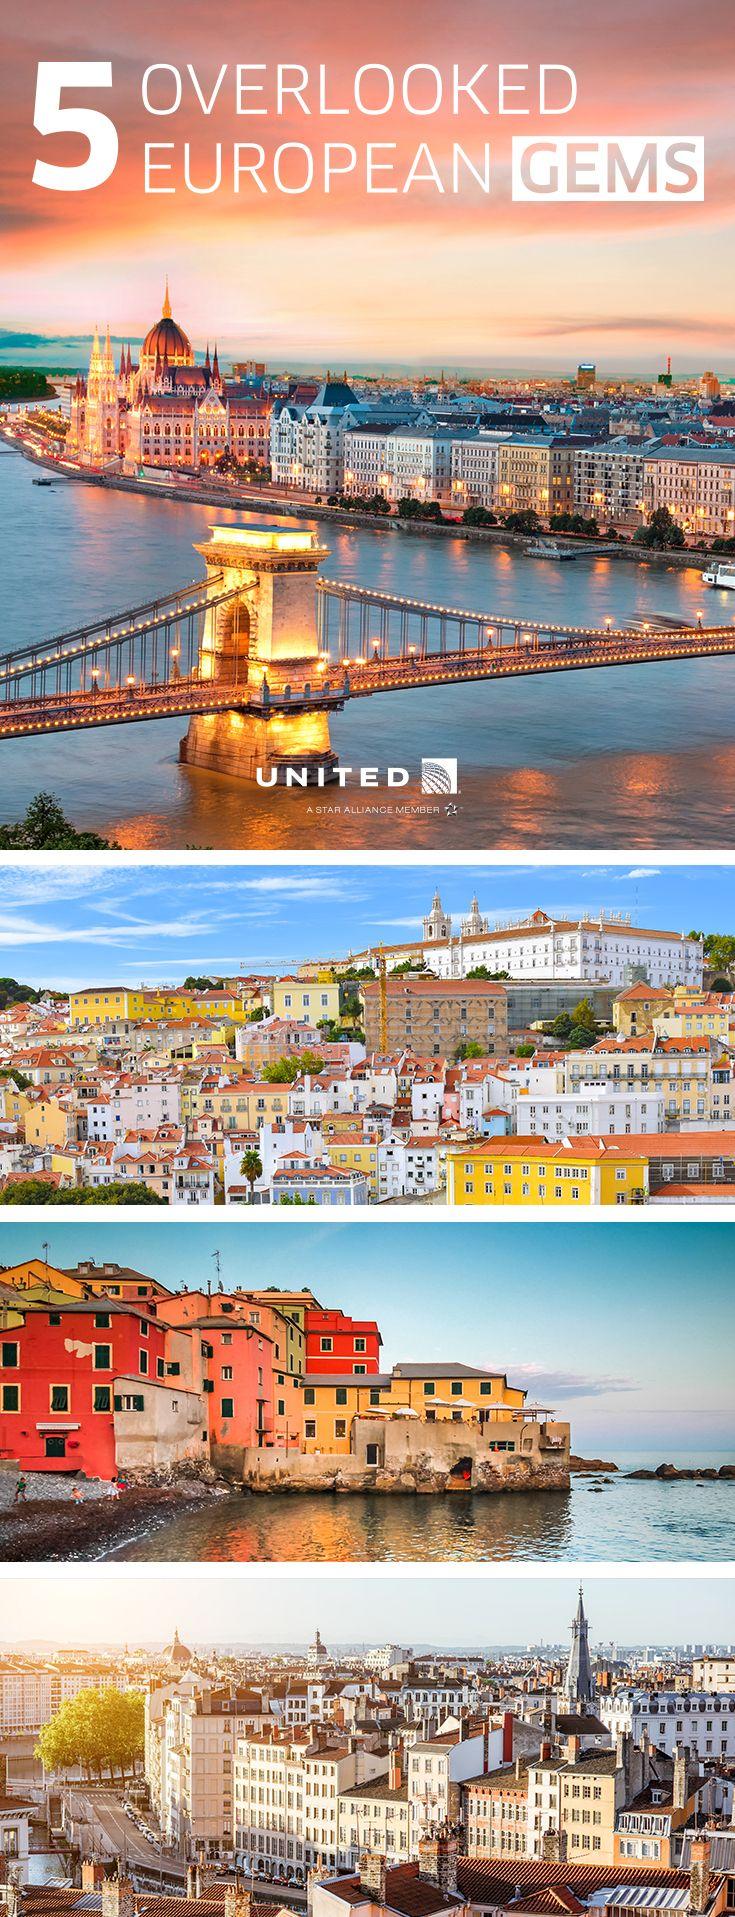 Budapest, Hungary | Lisbon, Portugal | Genoa, Italy | Lyon, France | Manchester, England